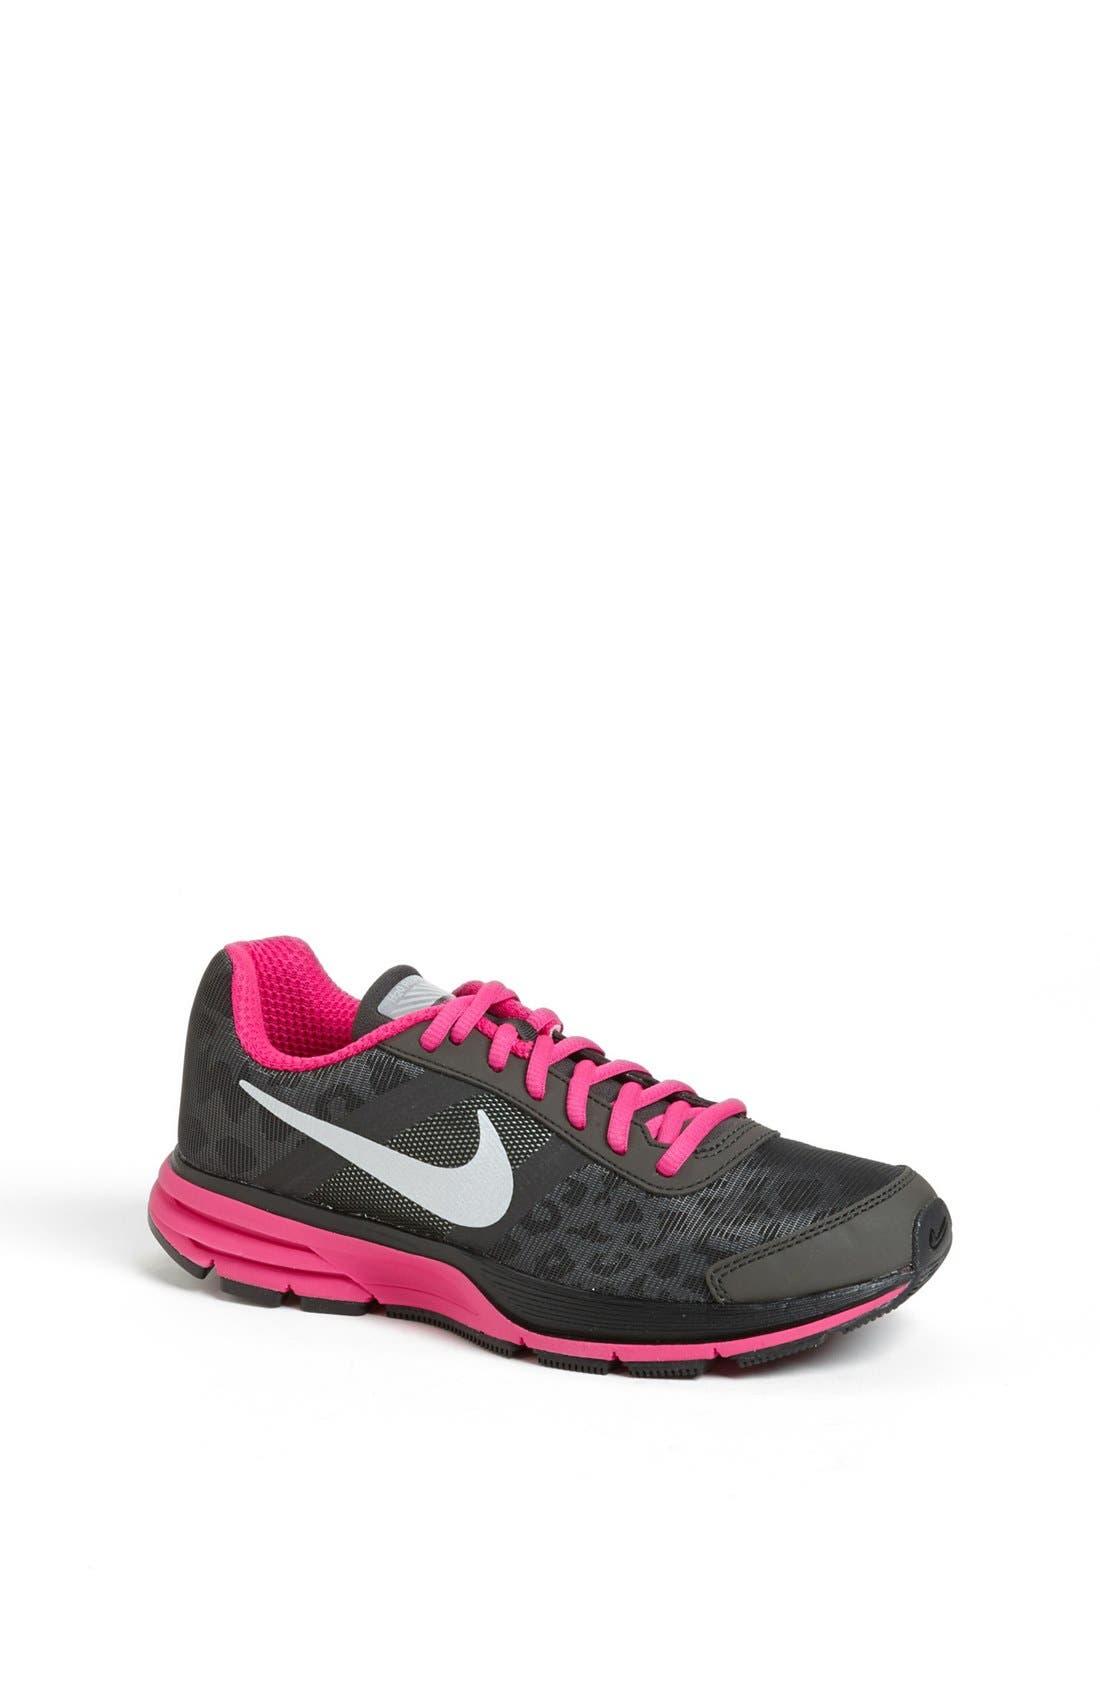 Alternate Image 1 Selected - Nike 'Air Pegasus+ 30 Shield' Running Shoe (Little Kid & Big Kid)